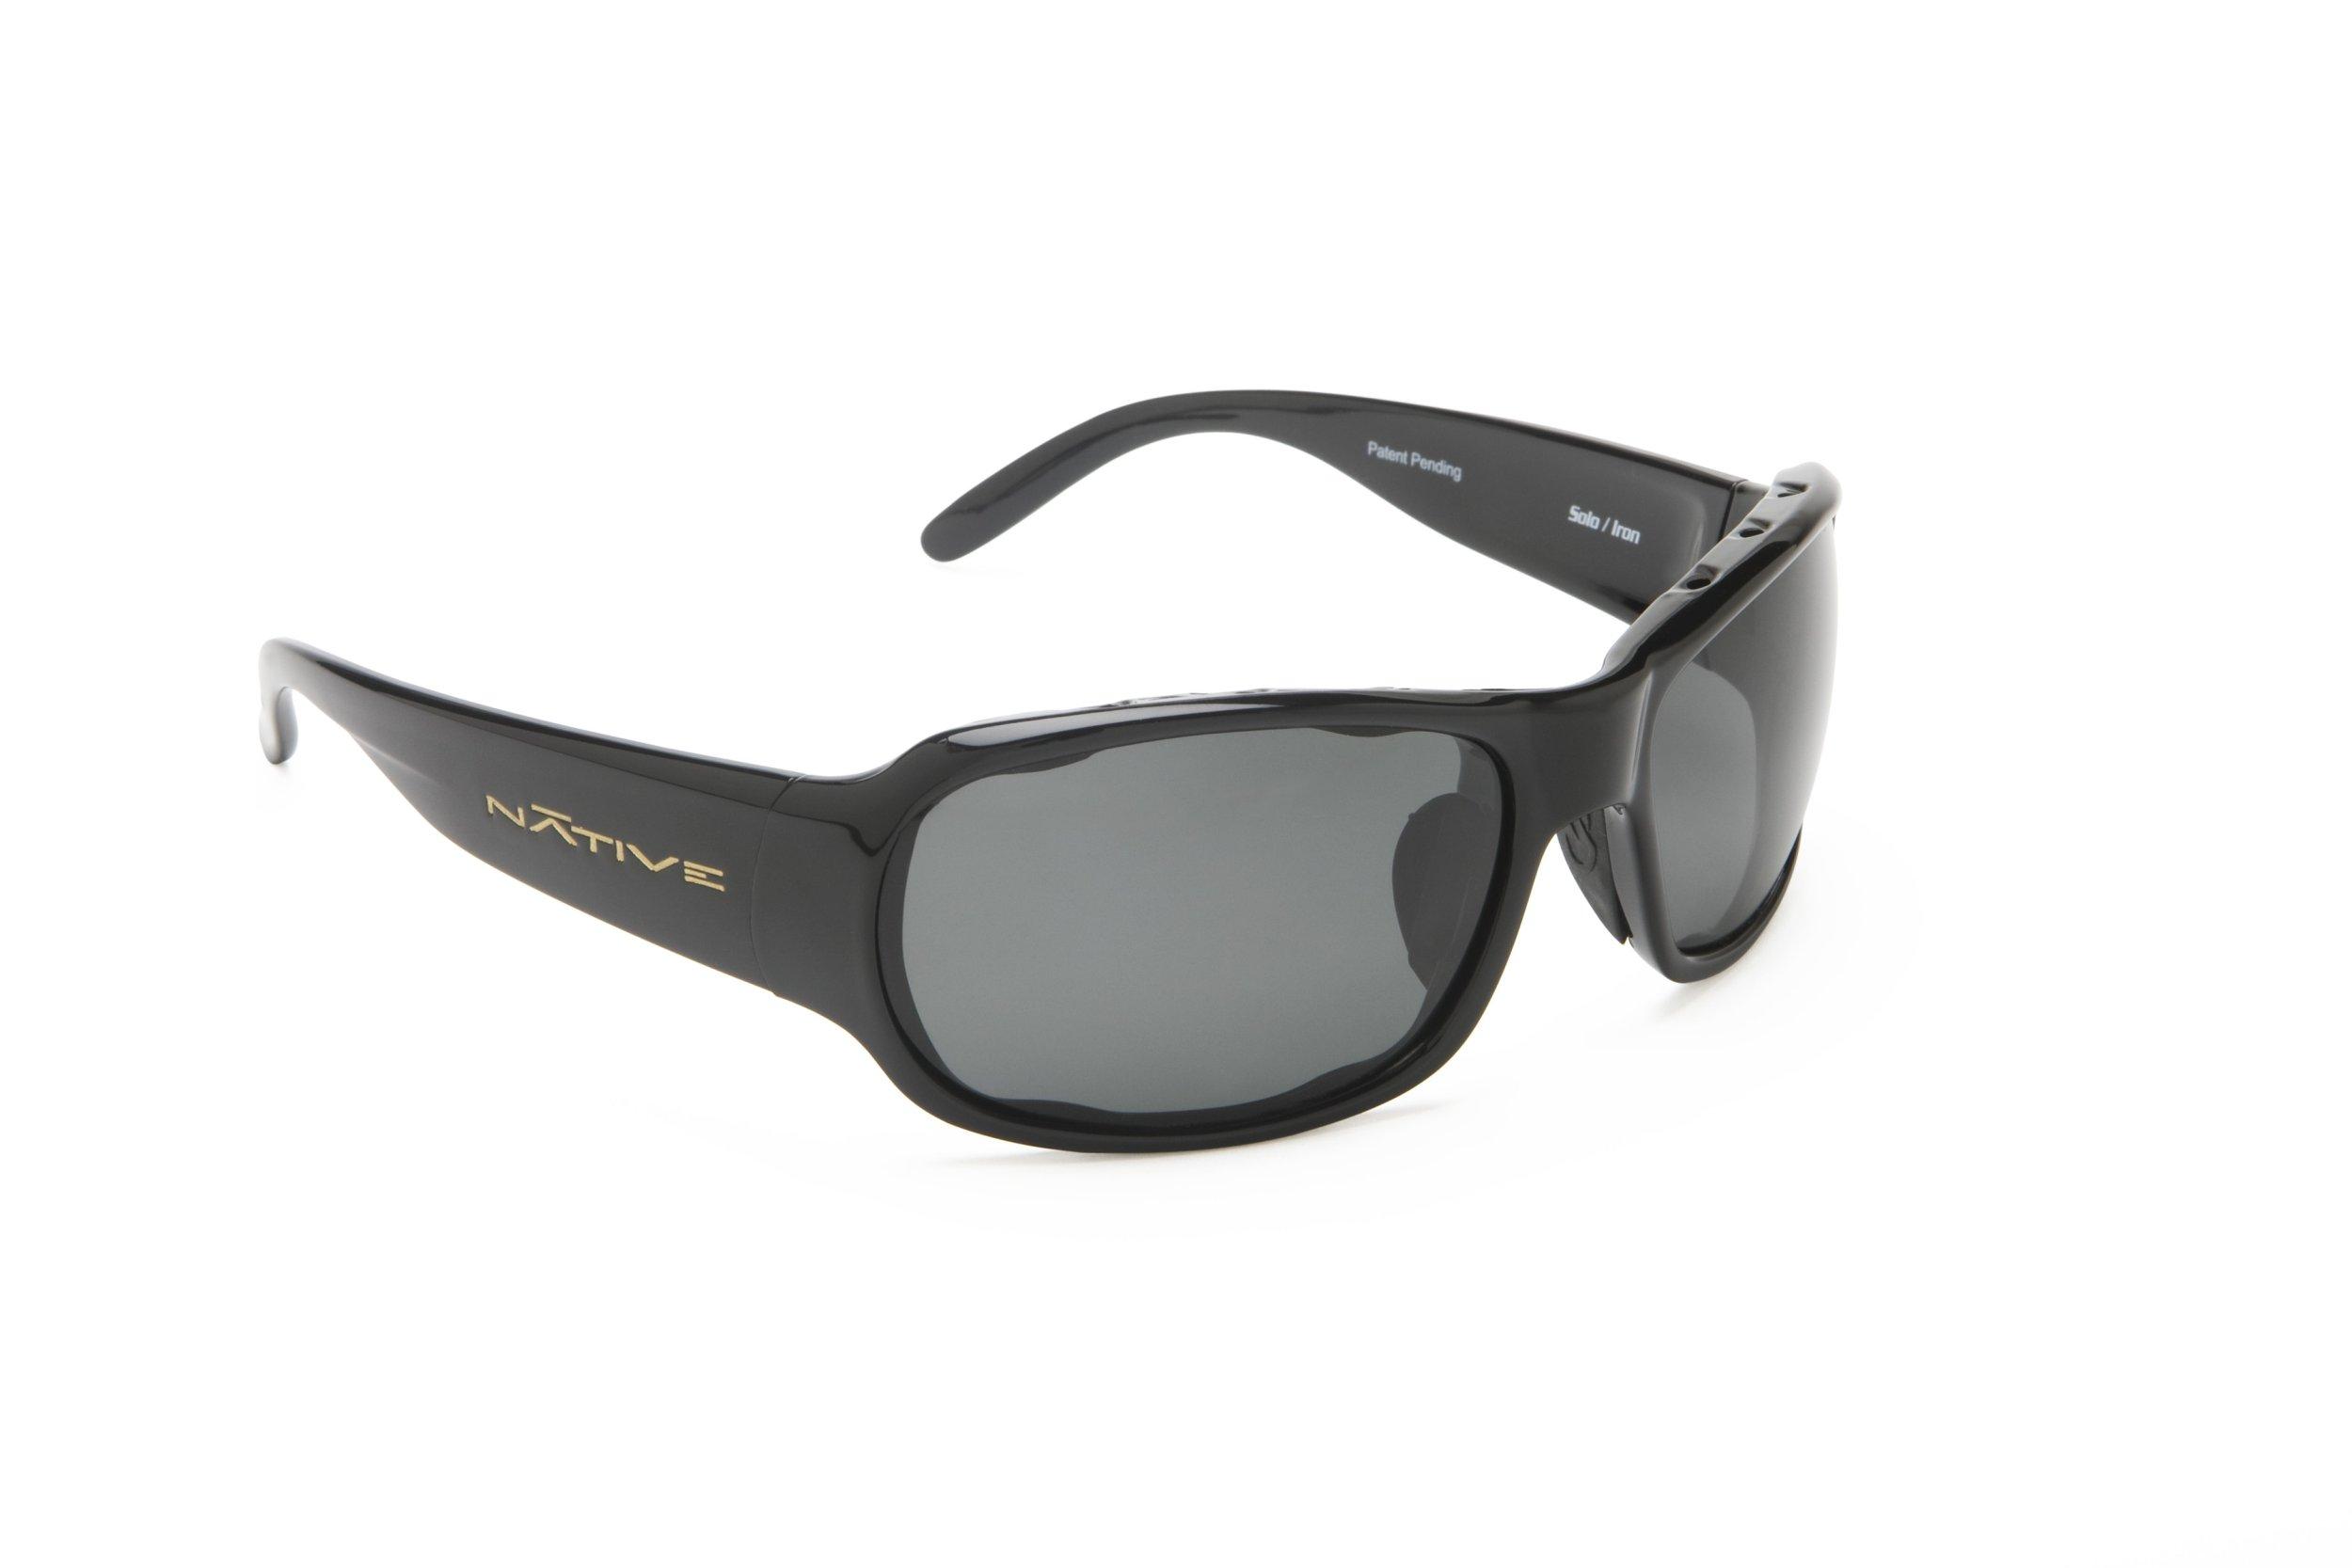 Native Eyewear Solo Sunglasses, Iron with Gray Lens